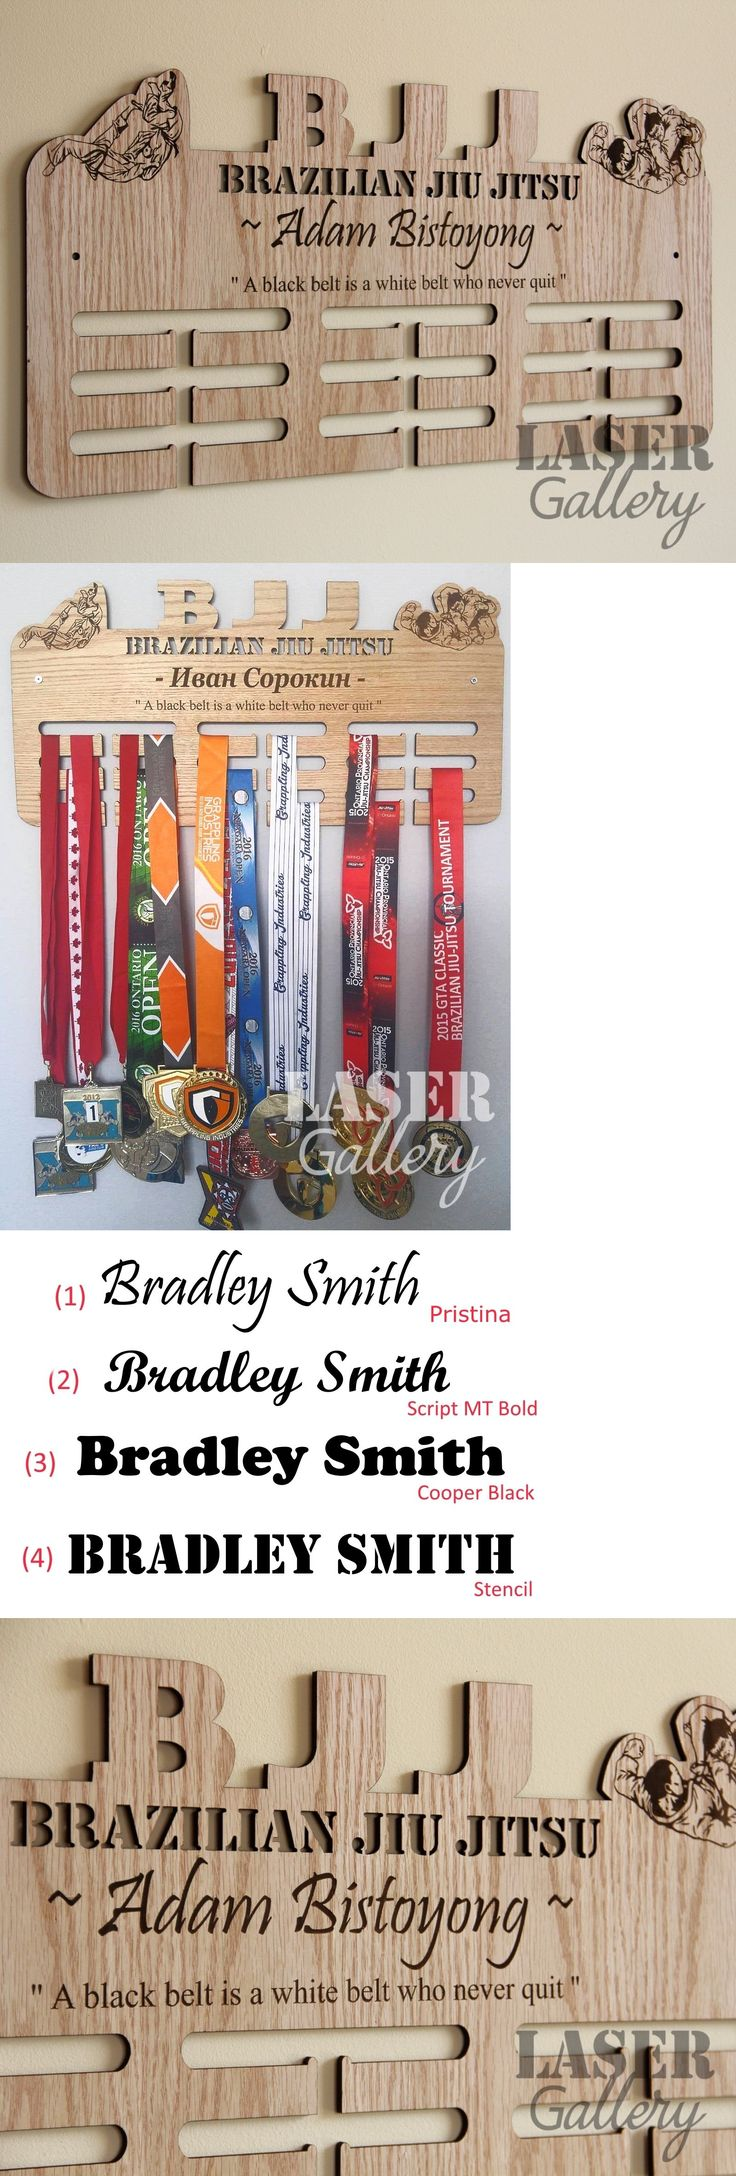 Belt Displays 179768: Xl Brazilian Jiu Jitsu 24X12 Wooden Medal Hanger Laser Cut Medal Display Rack -> BUY IT NOW ONLY: $70 on eBay!